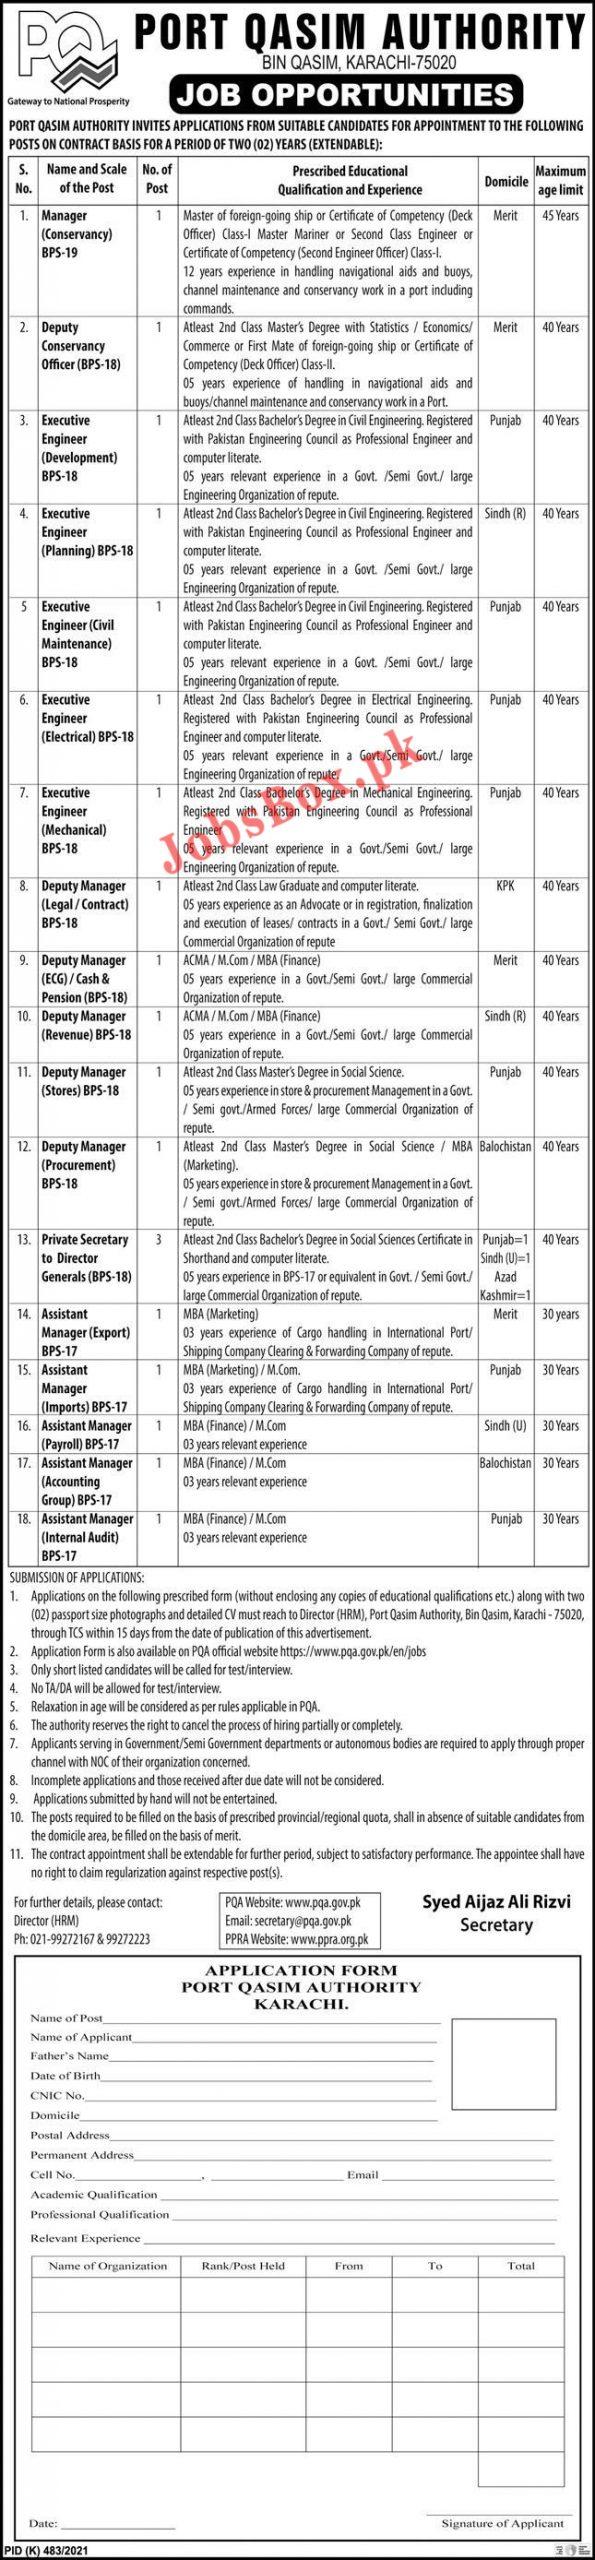 Port Qasim Authority PQA Jobs 2021 – Application Form via www.pqa.gov.pk